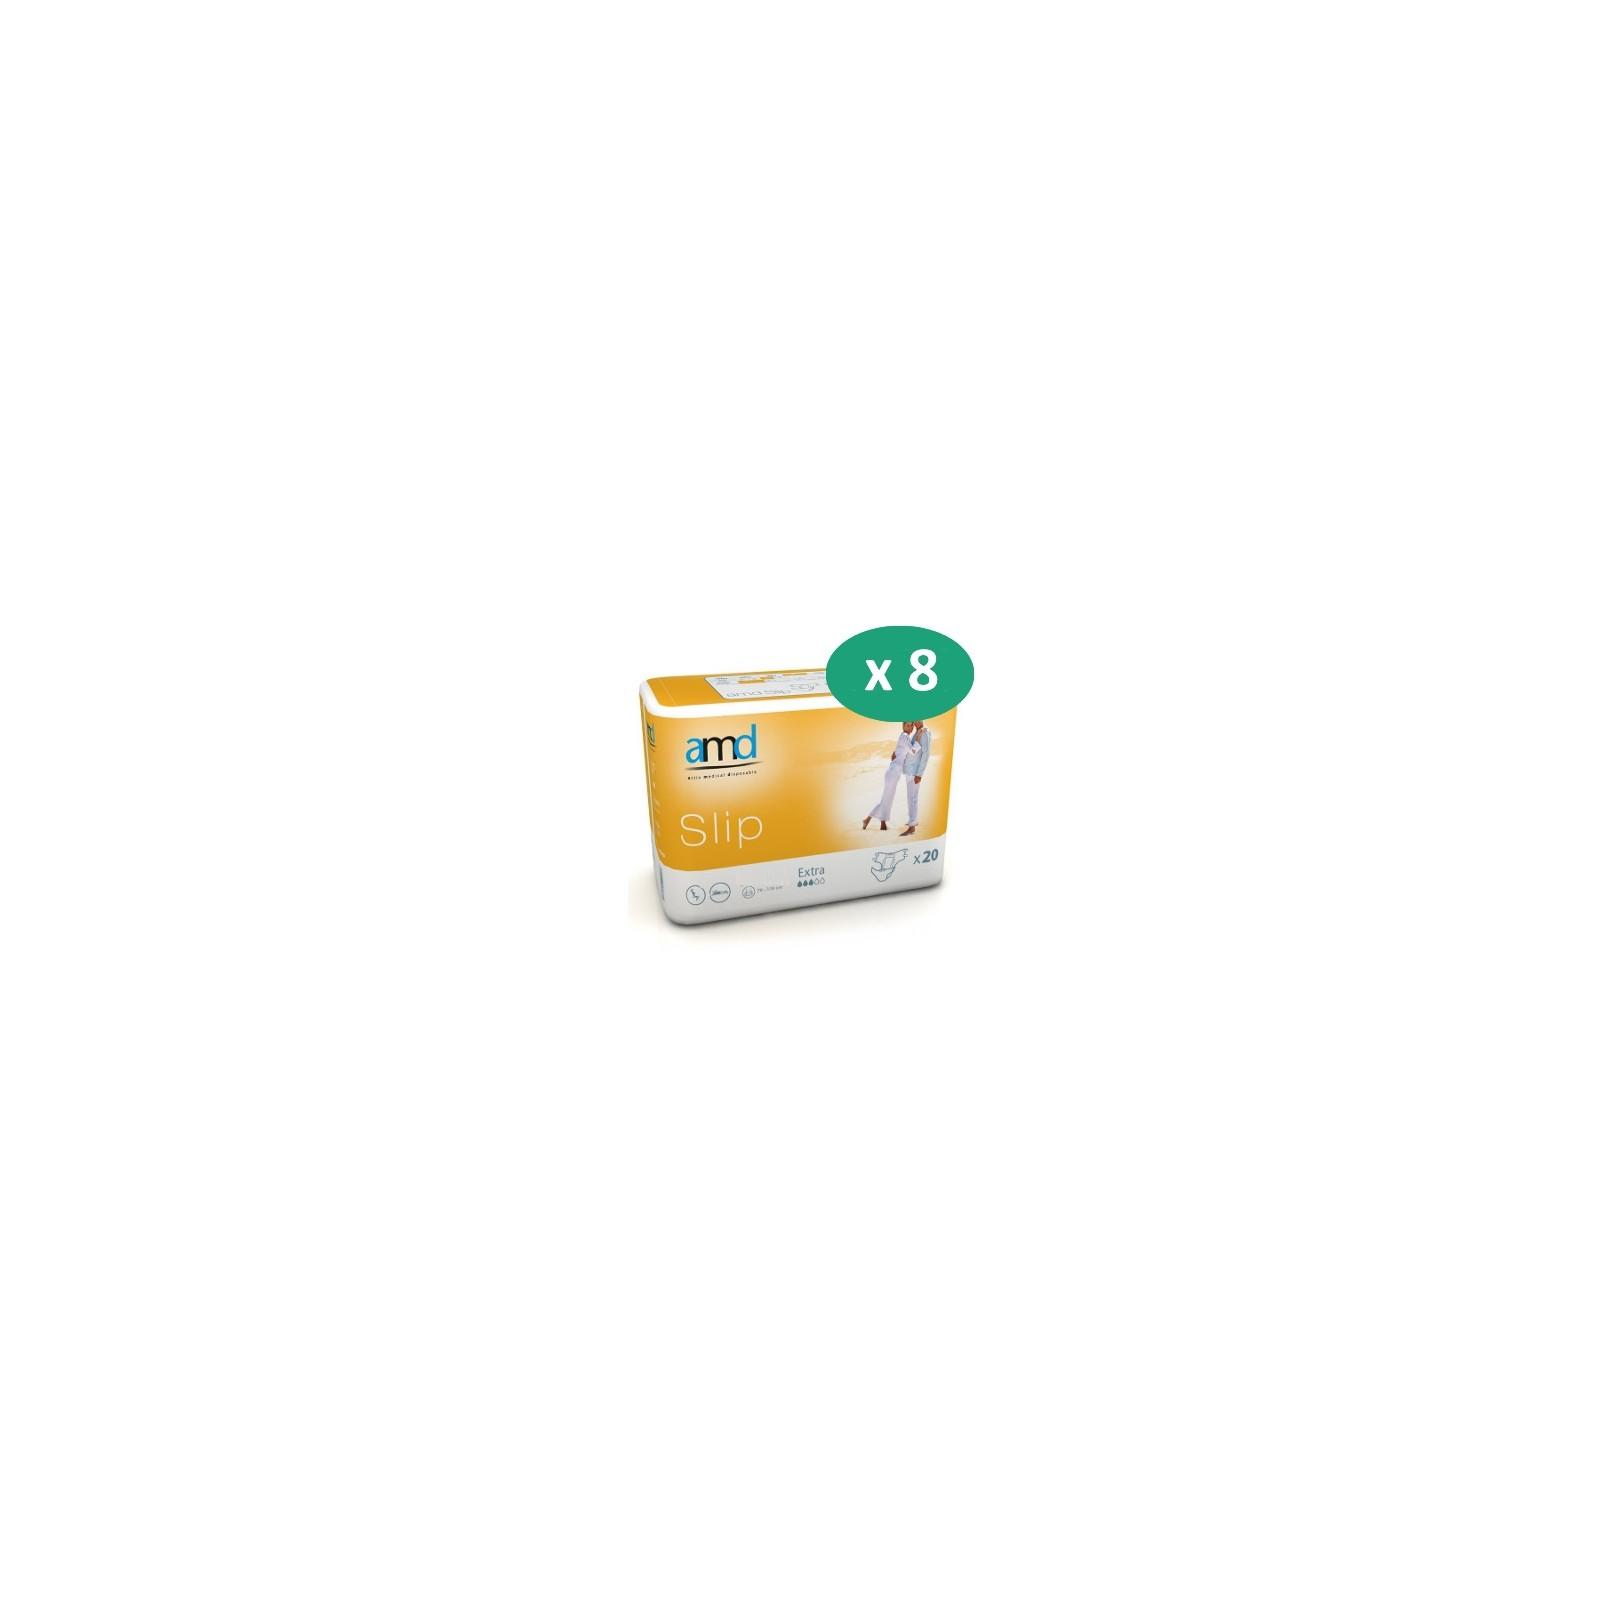 8 paquets de AMD Slip Extra| SenUp.com